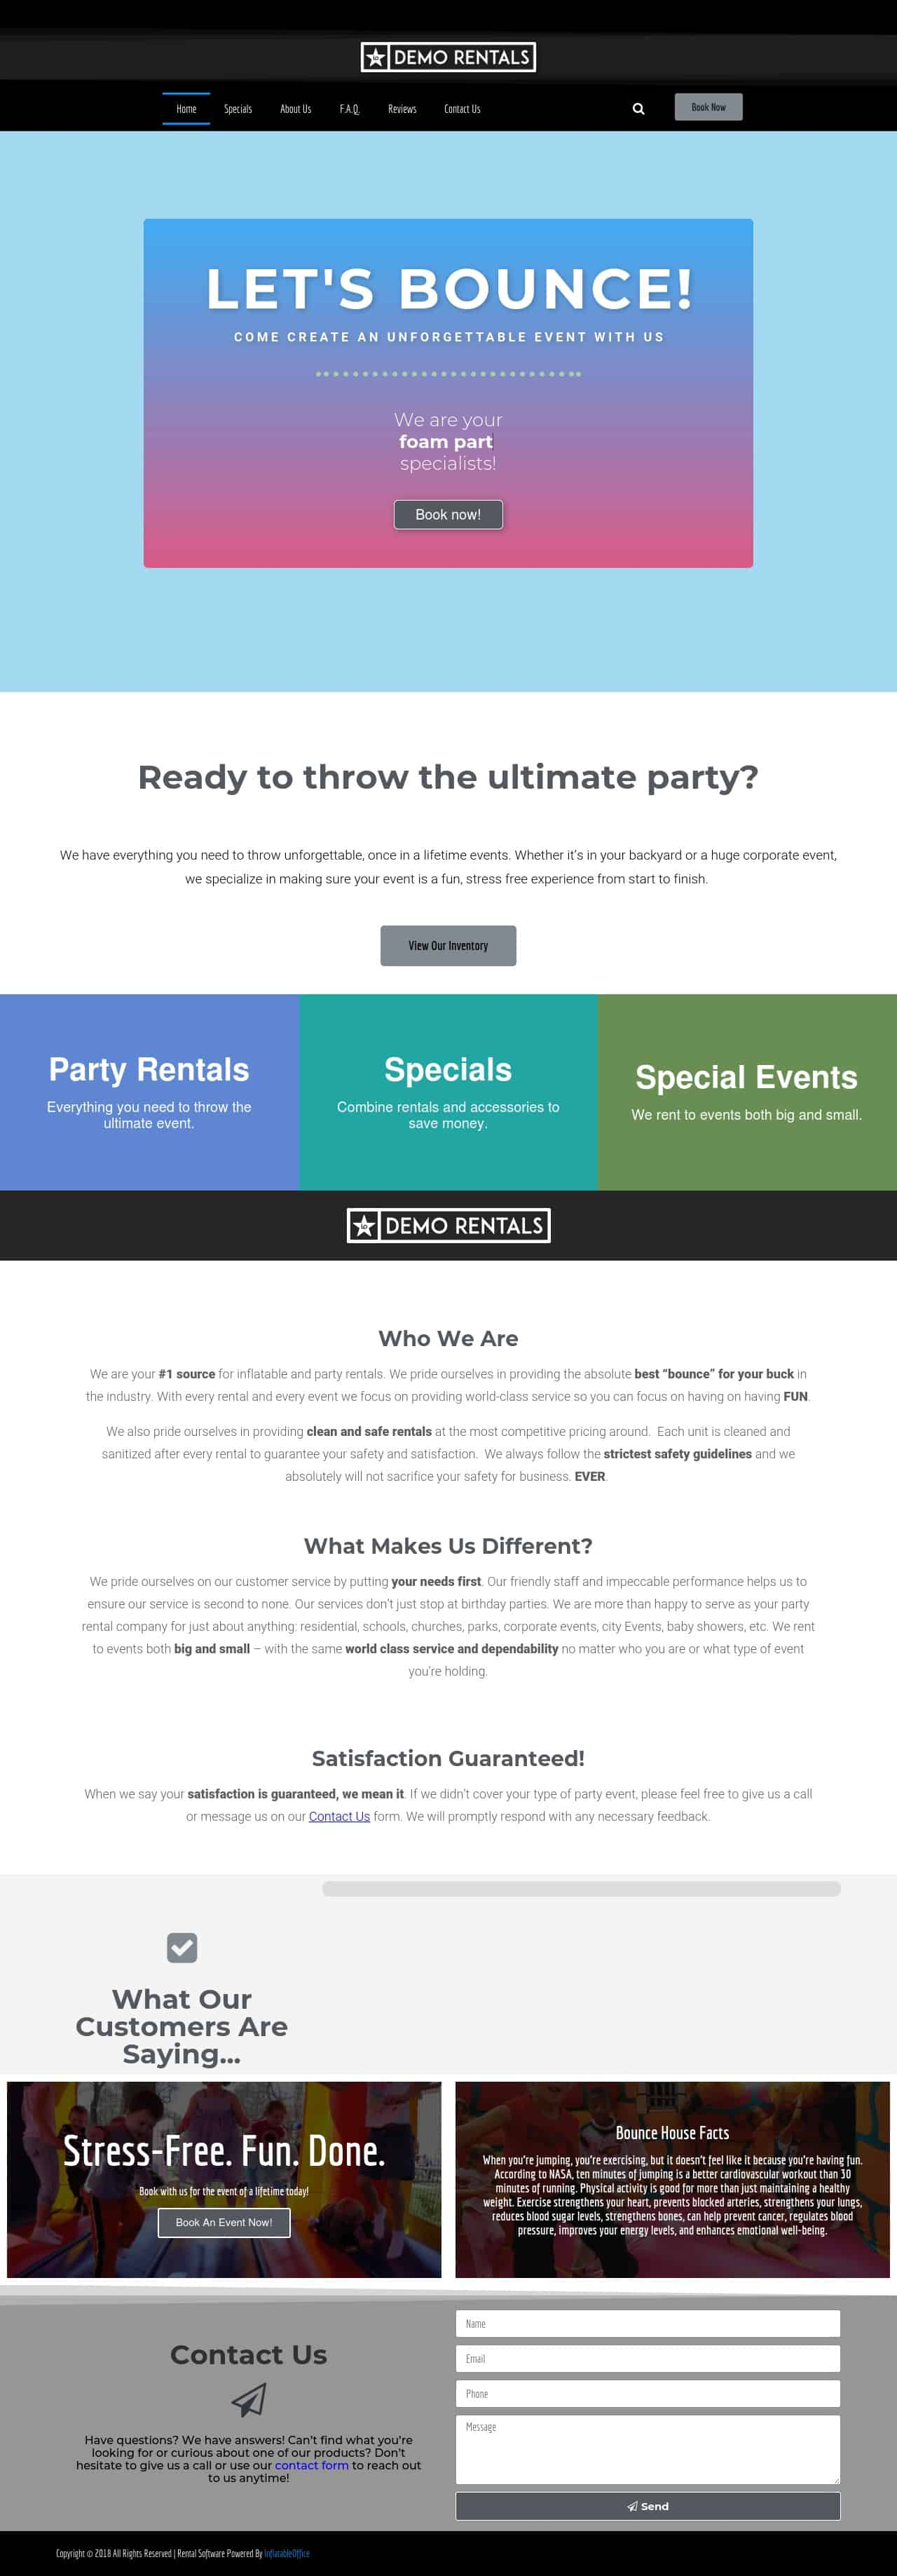 InflatableOffice Icebreaker Template